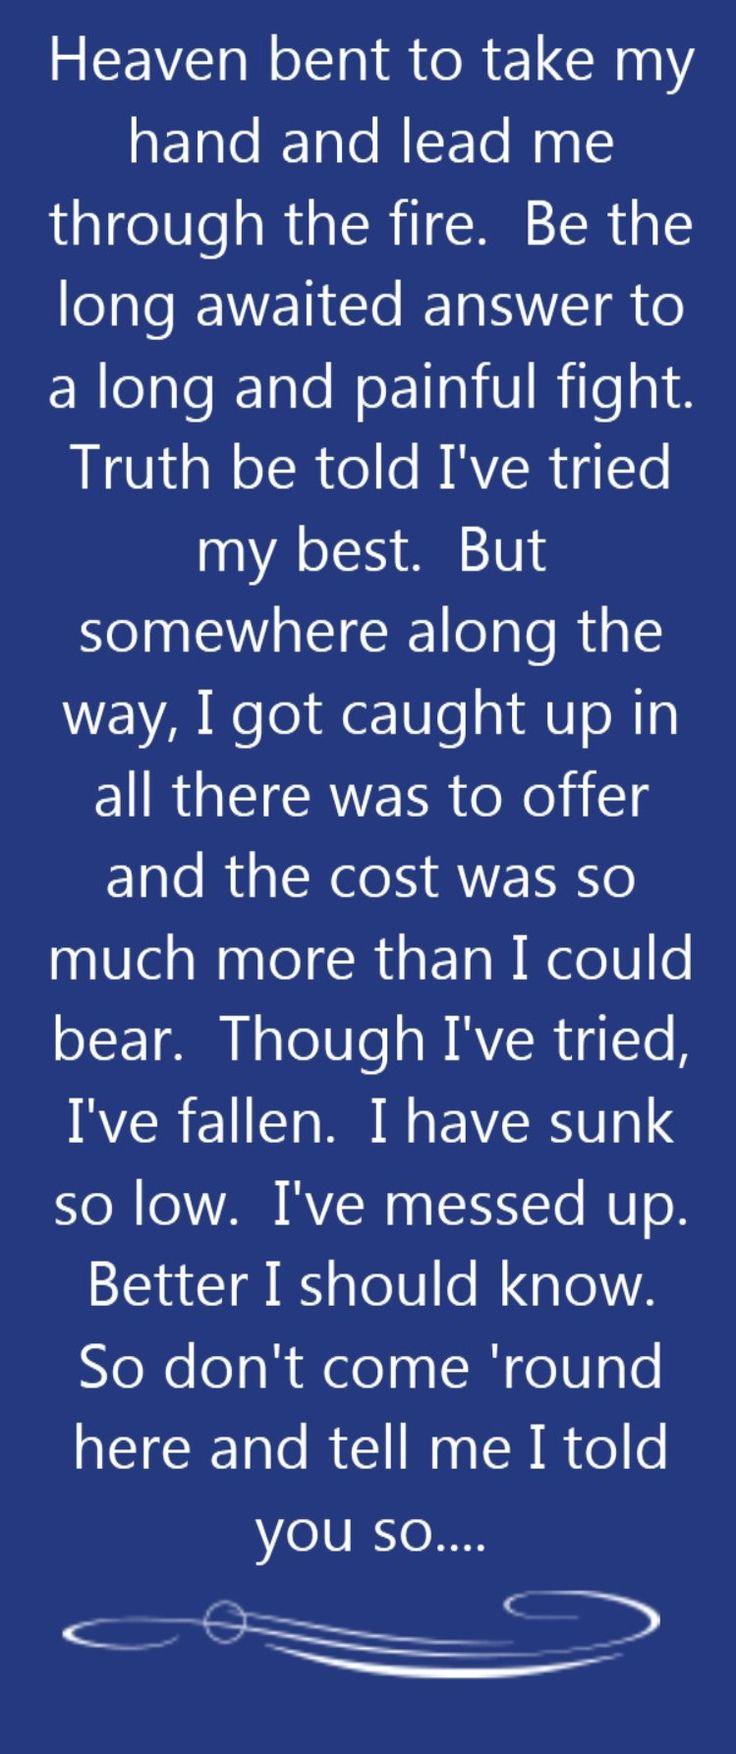 Sarah McLachlan - Fallen - song lyrics, song quotes, songs, music lyrics, music quotes,